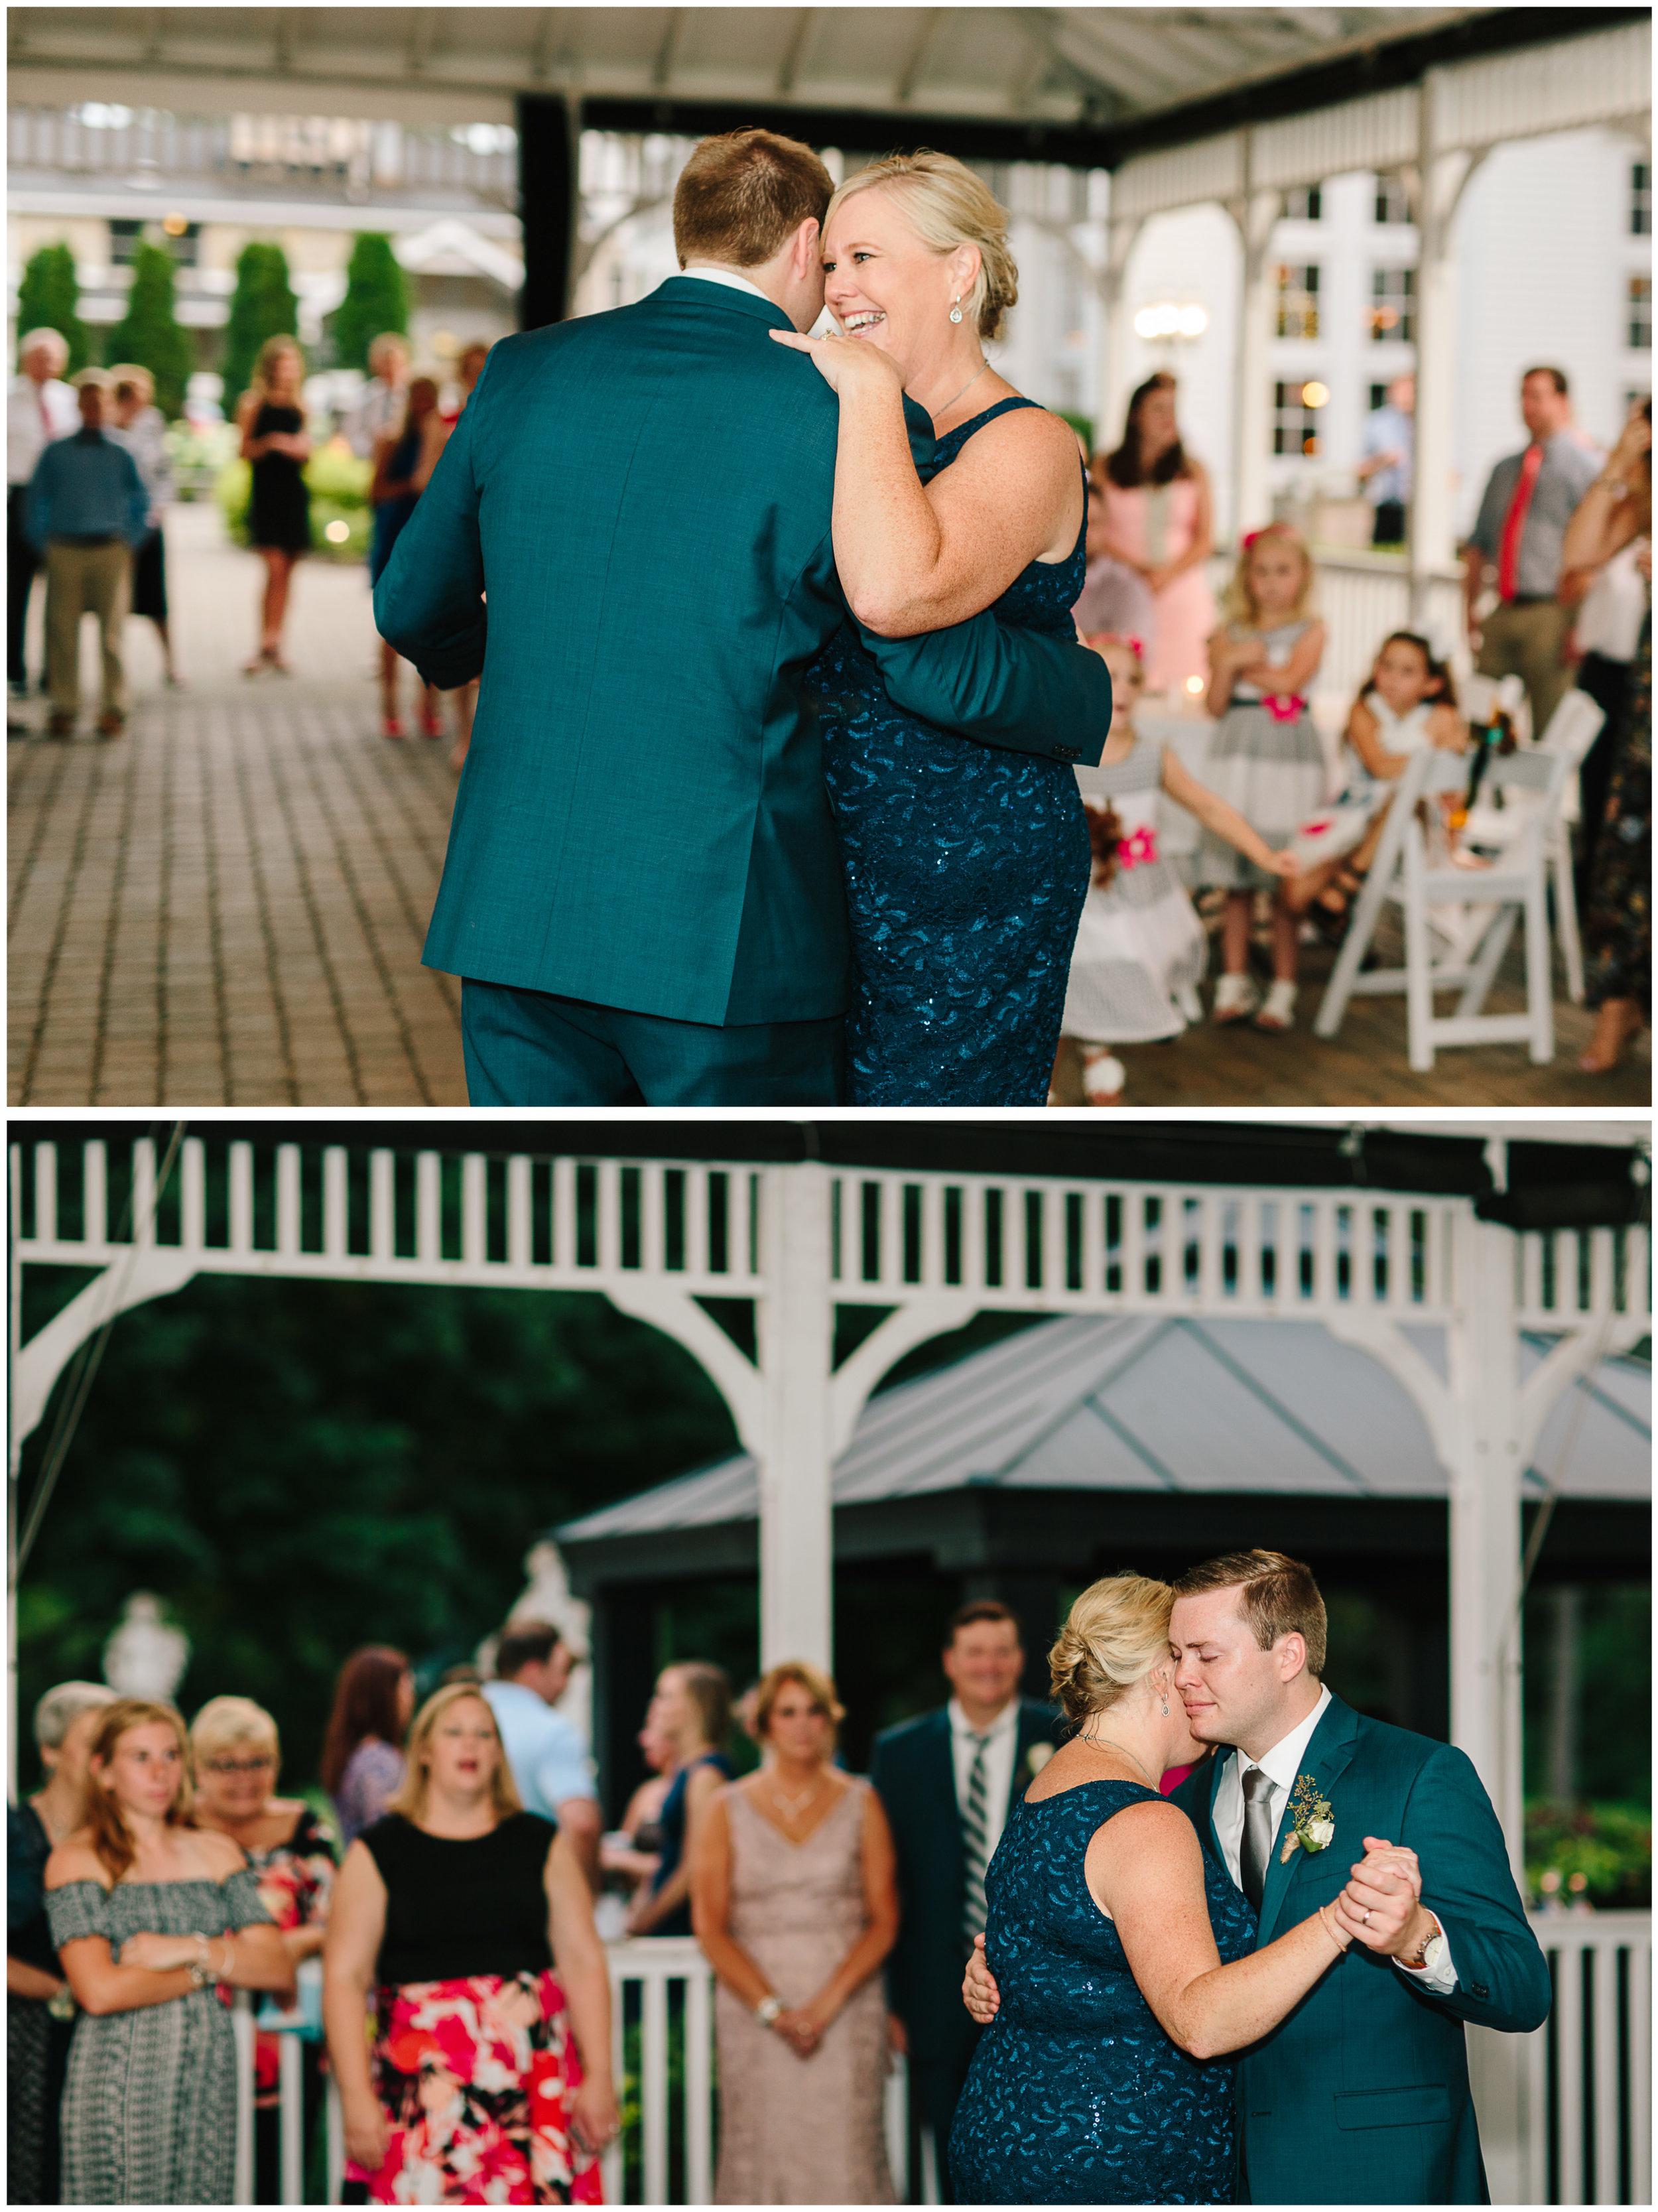 ann_arbor_michigan_wedding_93.jpg